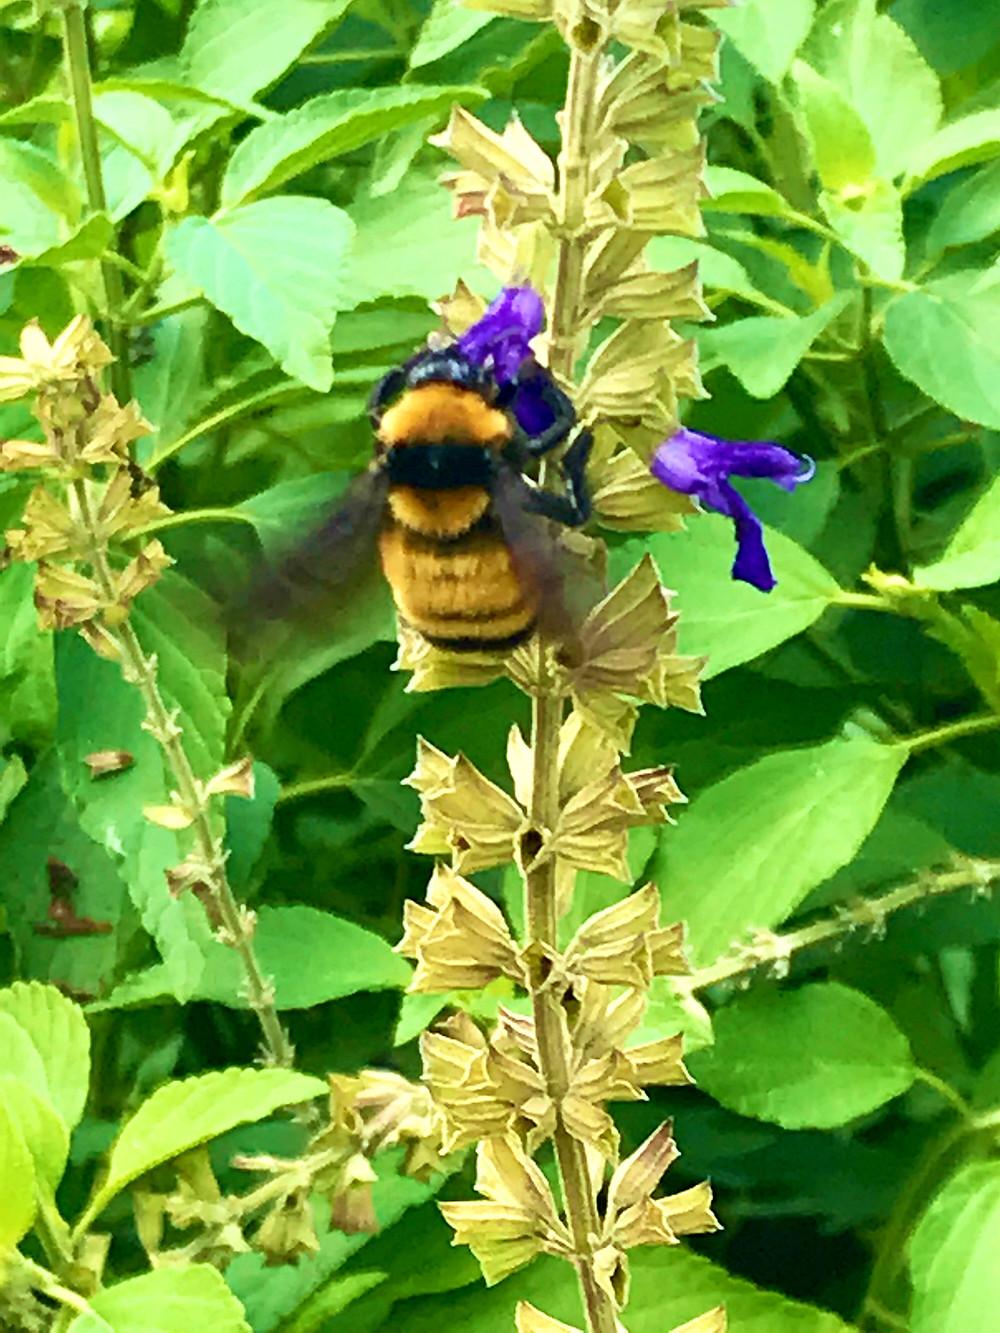 bumblebee, great oaks farm, leander tx, gardening, texas garden, pollinator